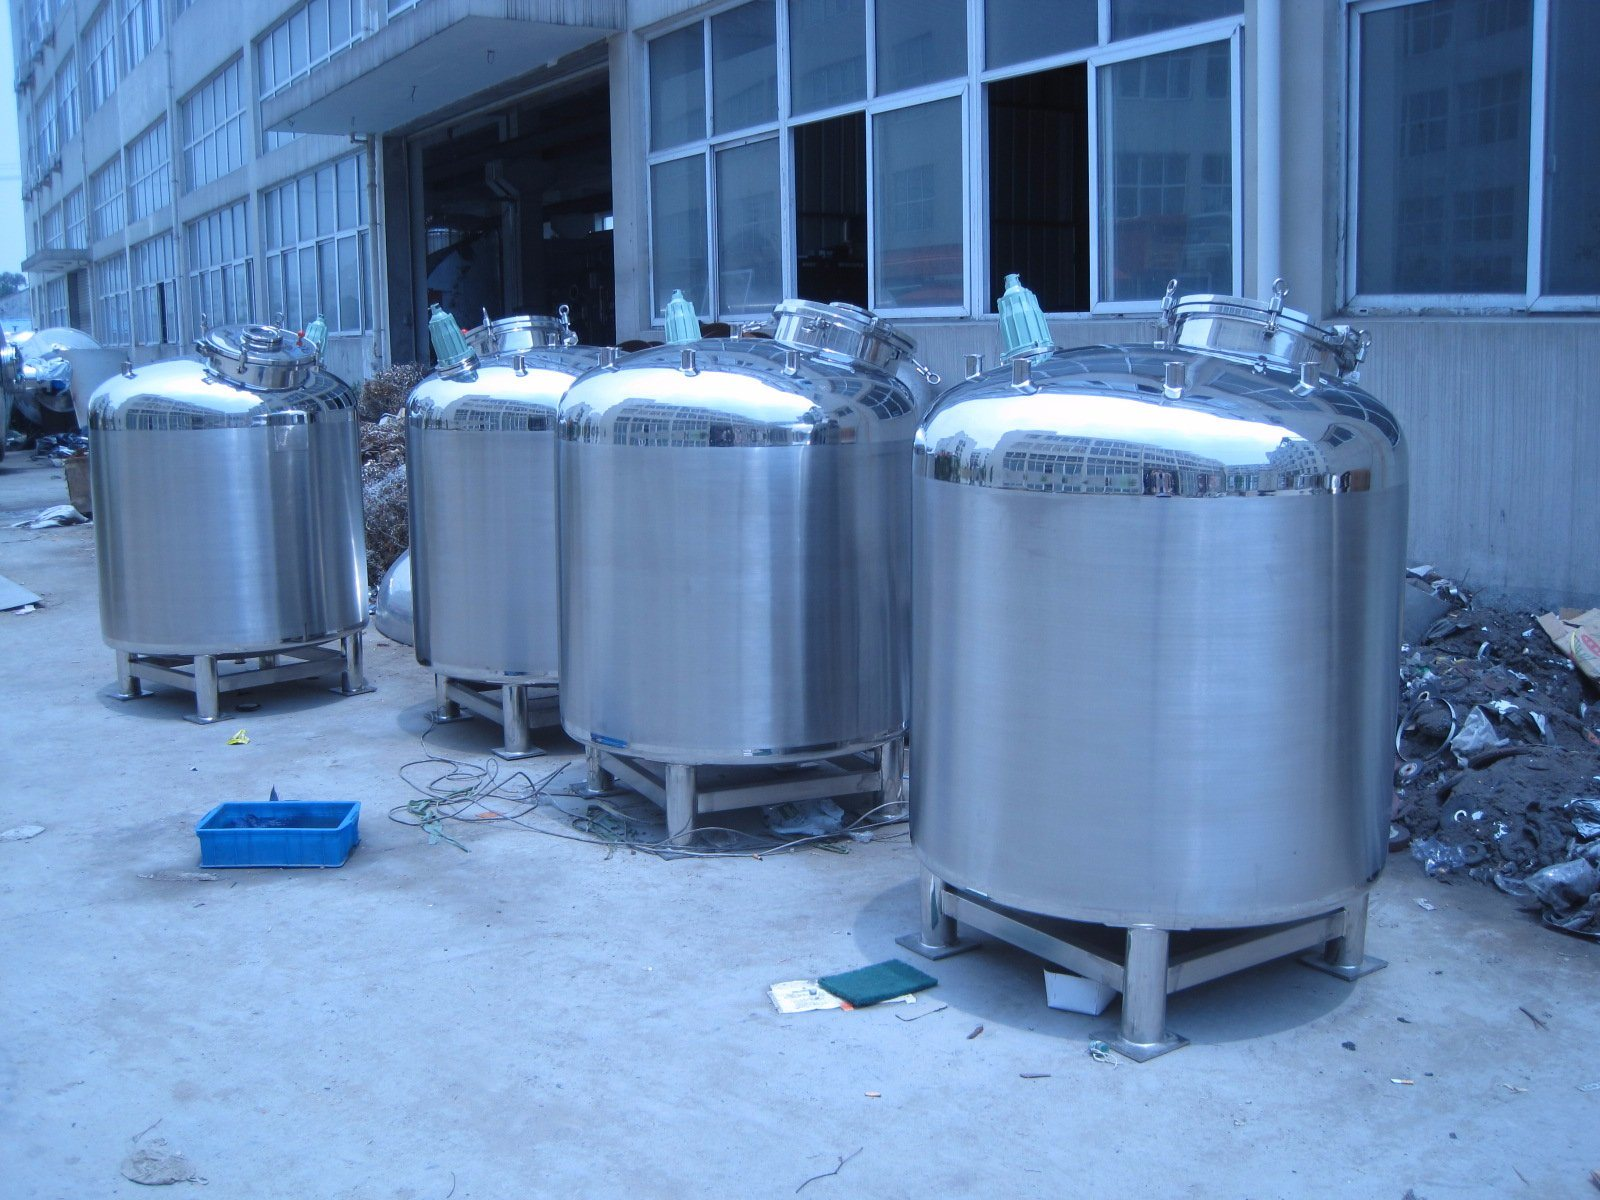 China Stainless Steel Hot Water Storage Tank 2000 Liter - China ...